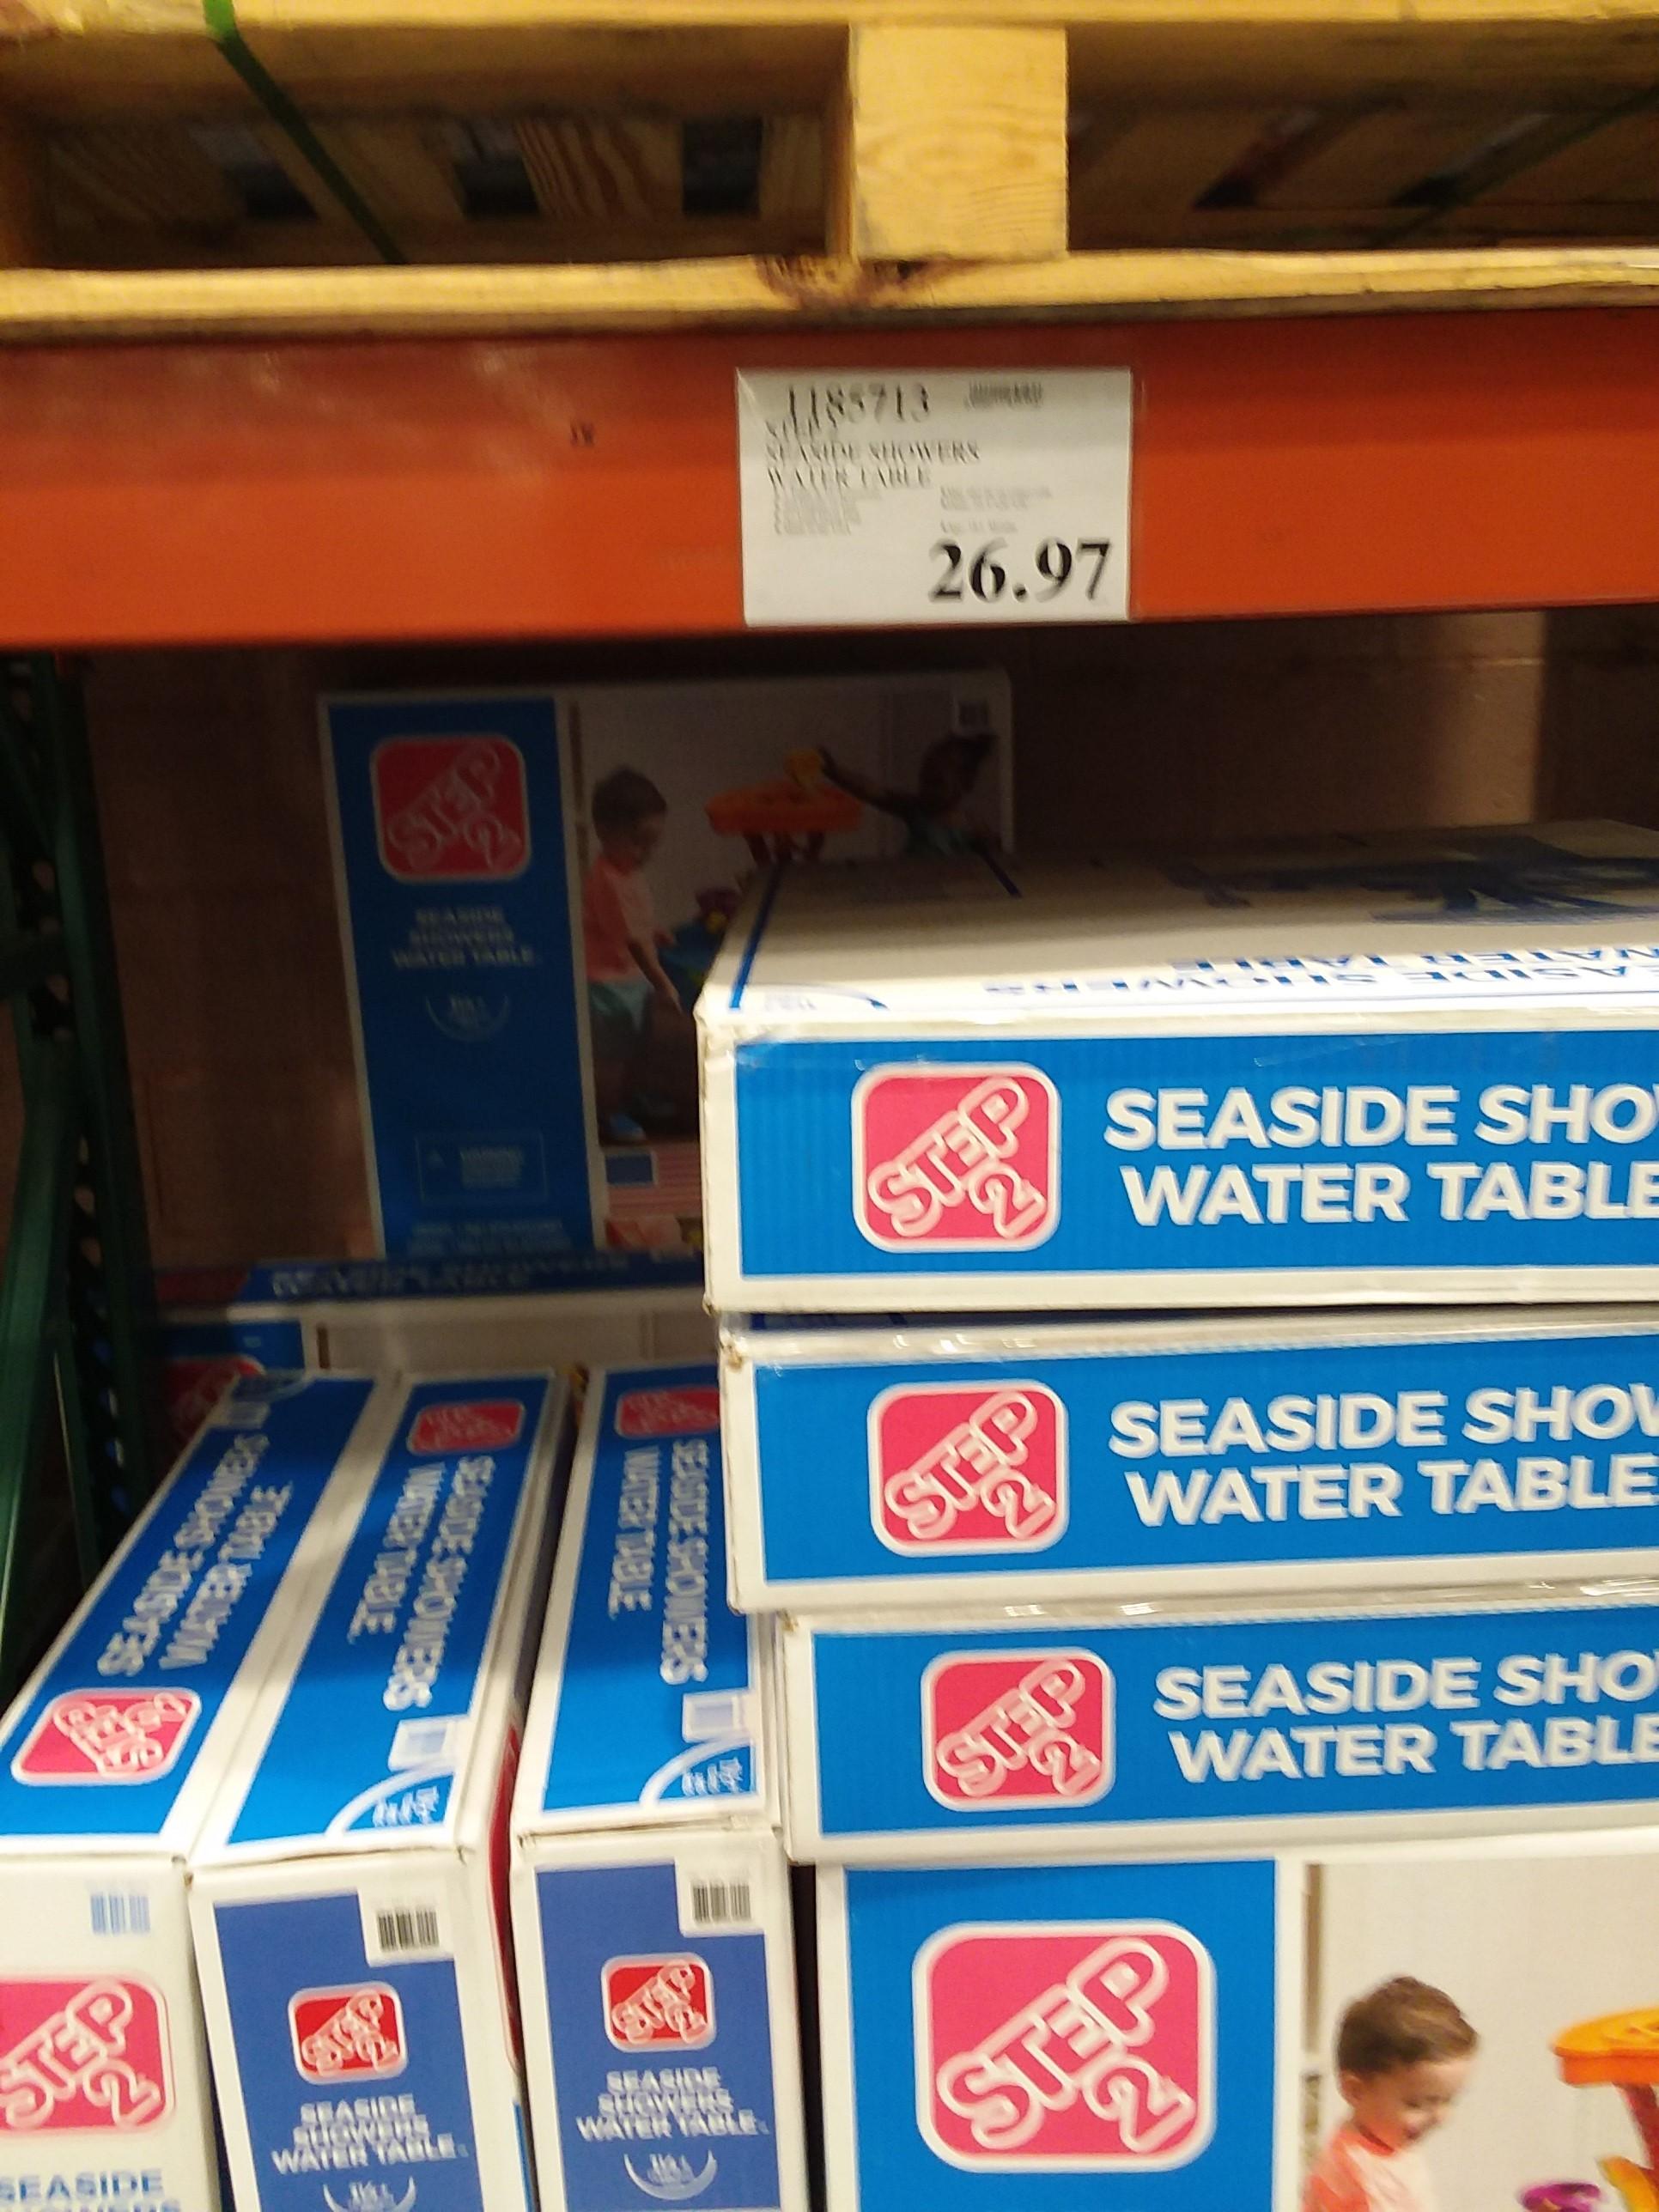 YMMV In-store Costco Seaside showers water table $26.93